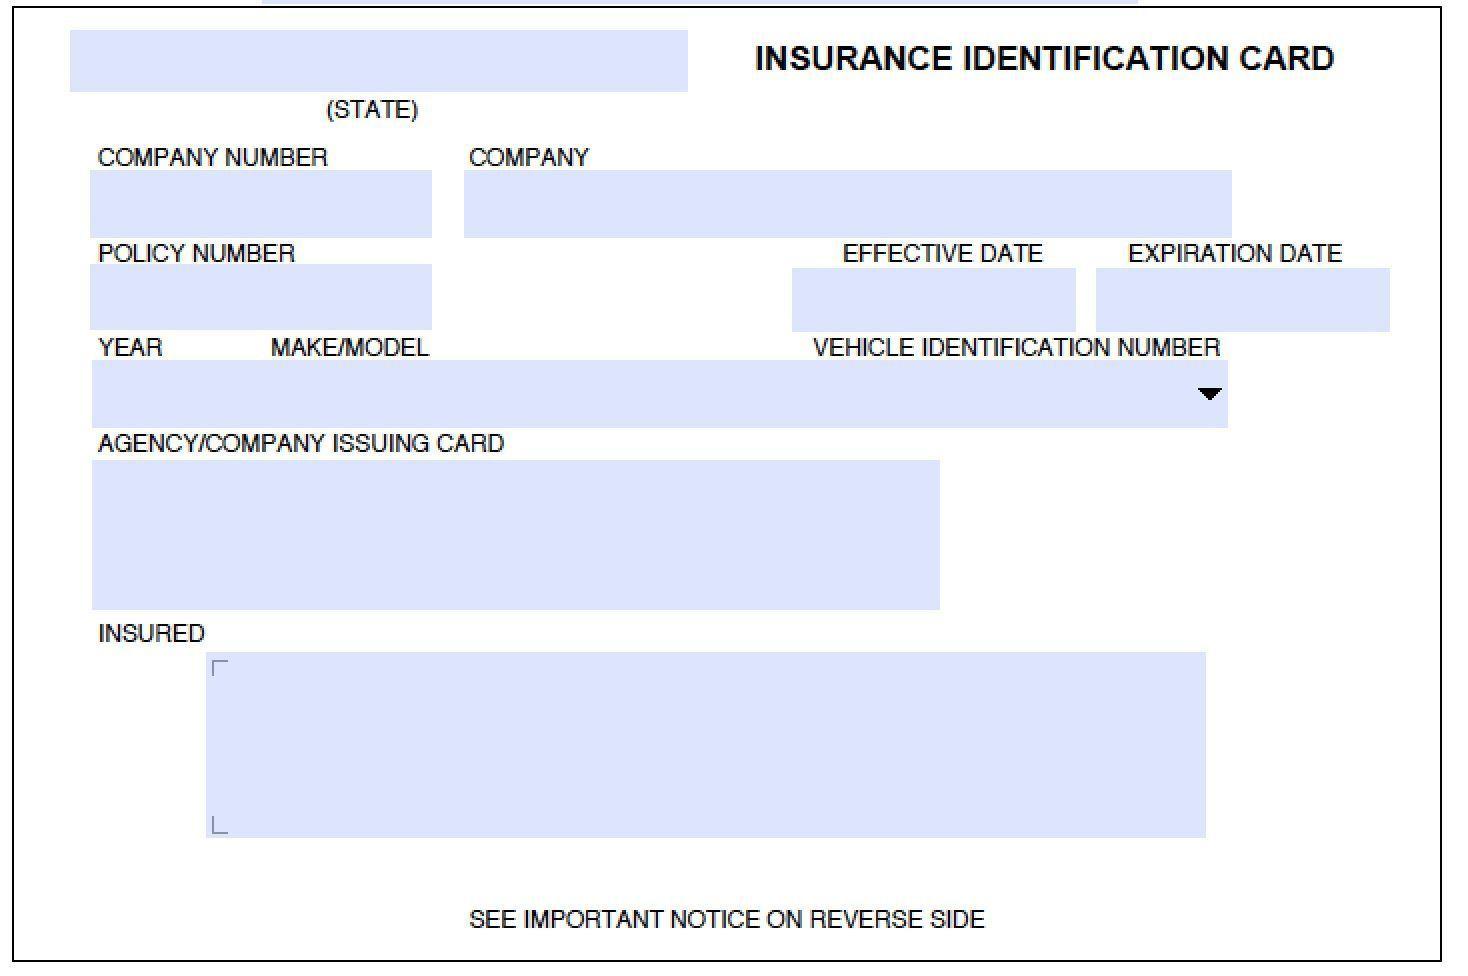 000 Sensational Auto Insurance Card Template Pdf Inspiration  Car Fake Geico FillerFull